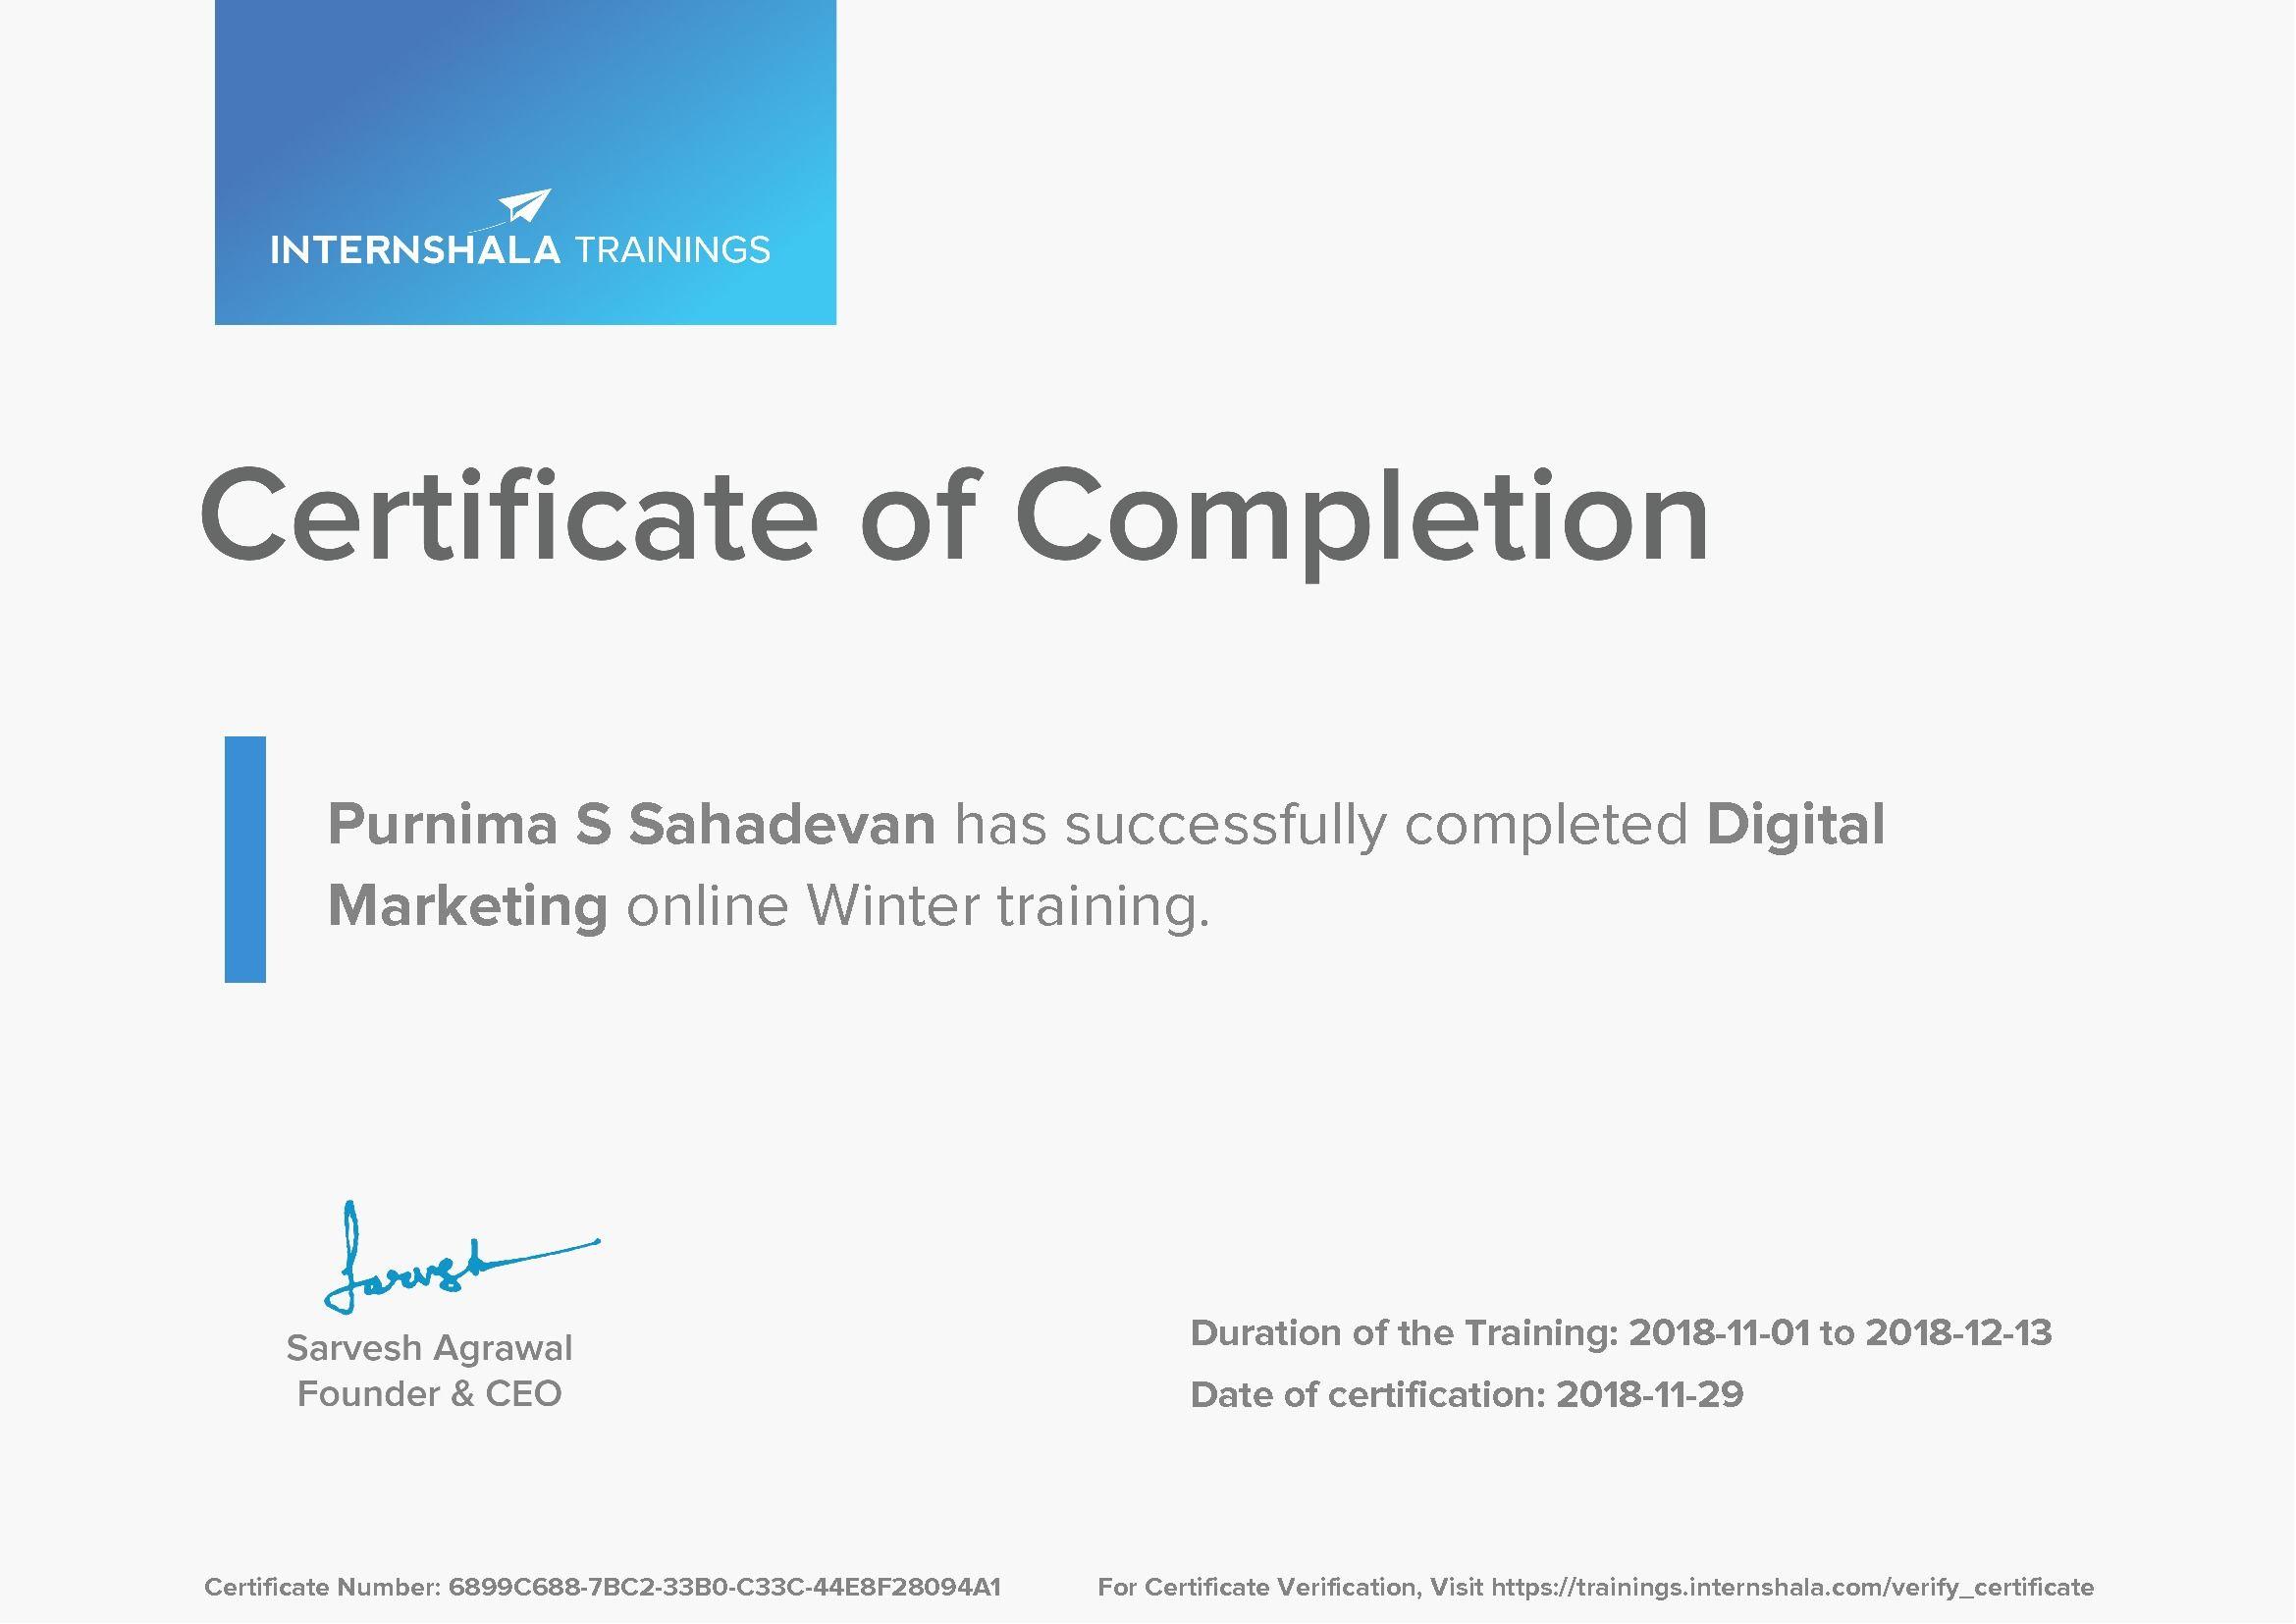 Pin By Purnima Sahadevan On Job Postings November 2018 Job Posting Certificate Of Completion